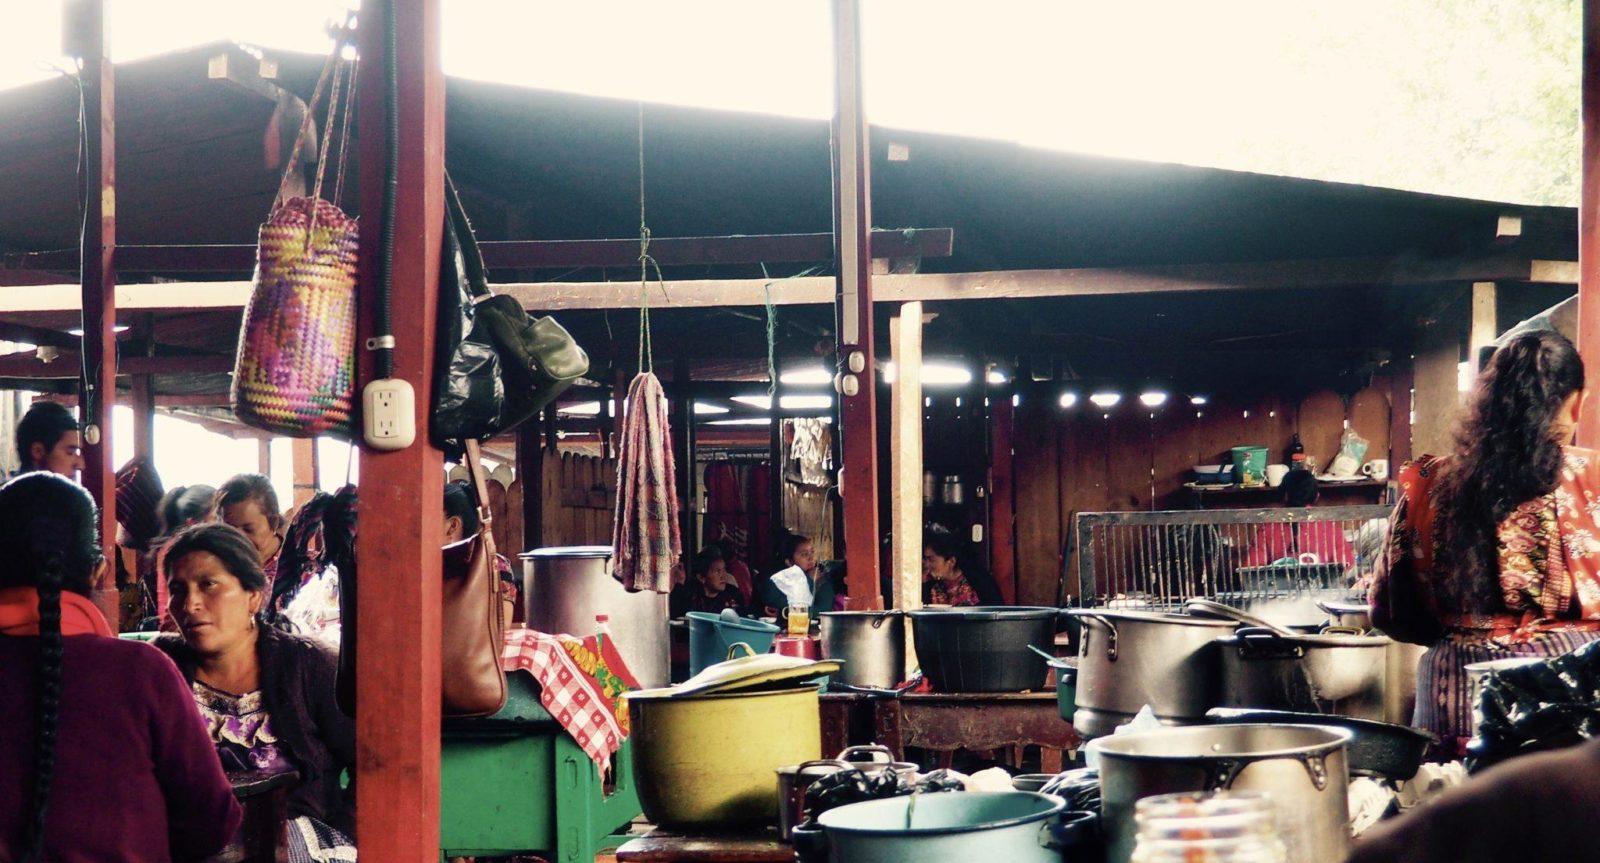 Guatemala Guides | Visiting Chichicastenango Market in Guatemala